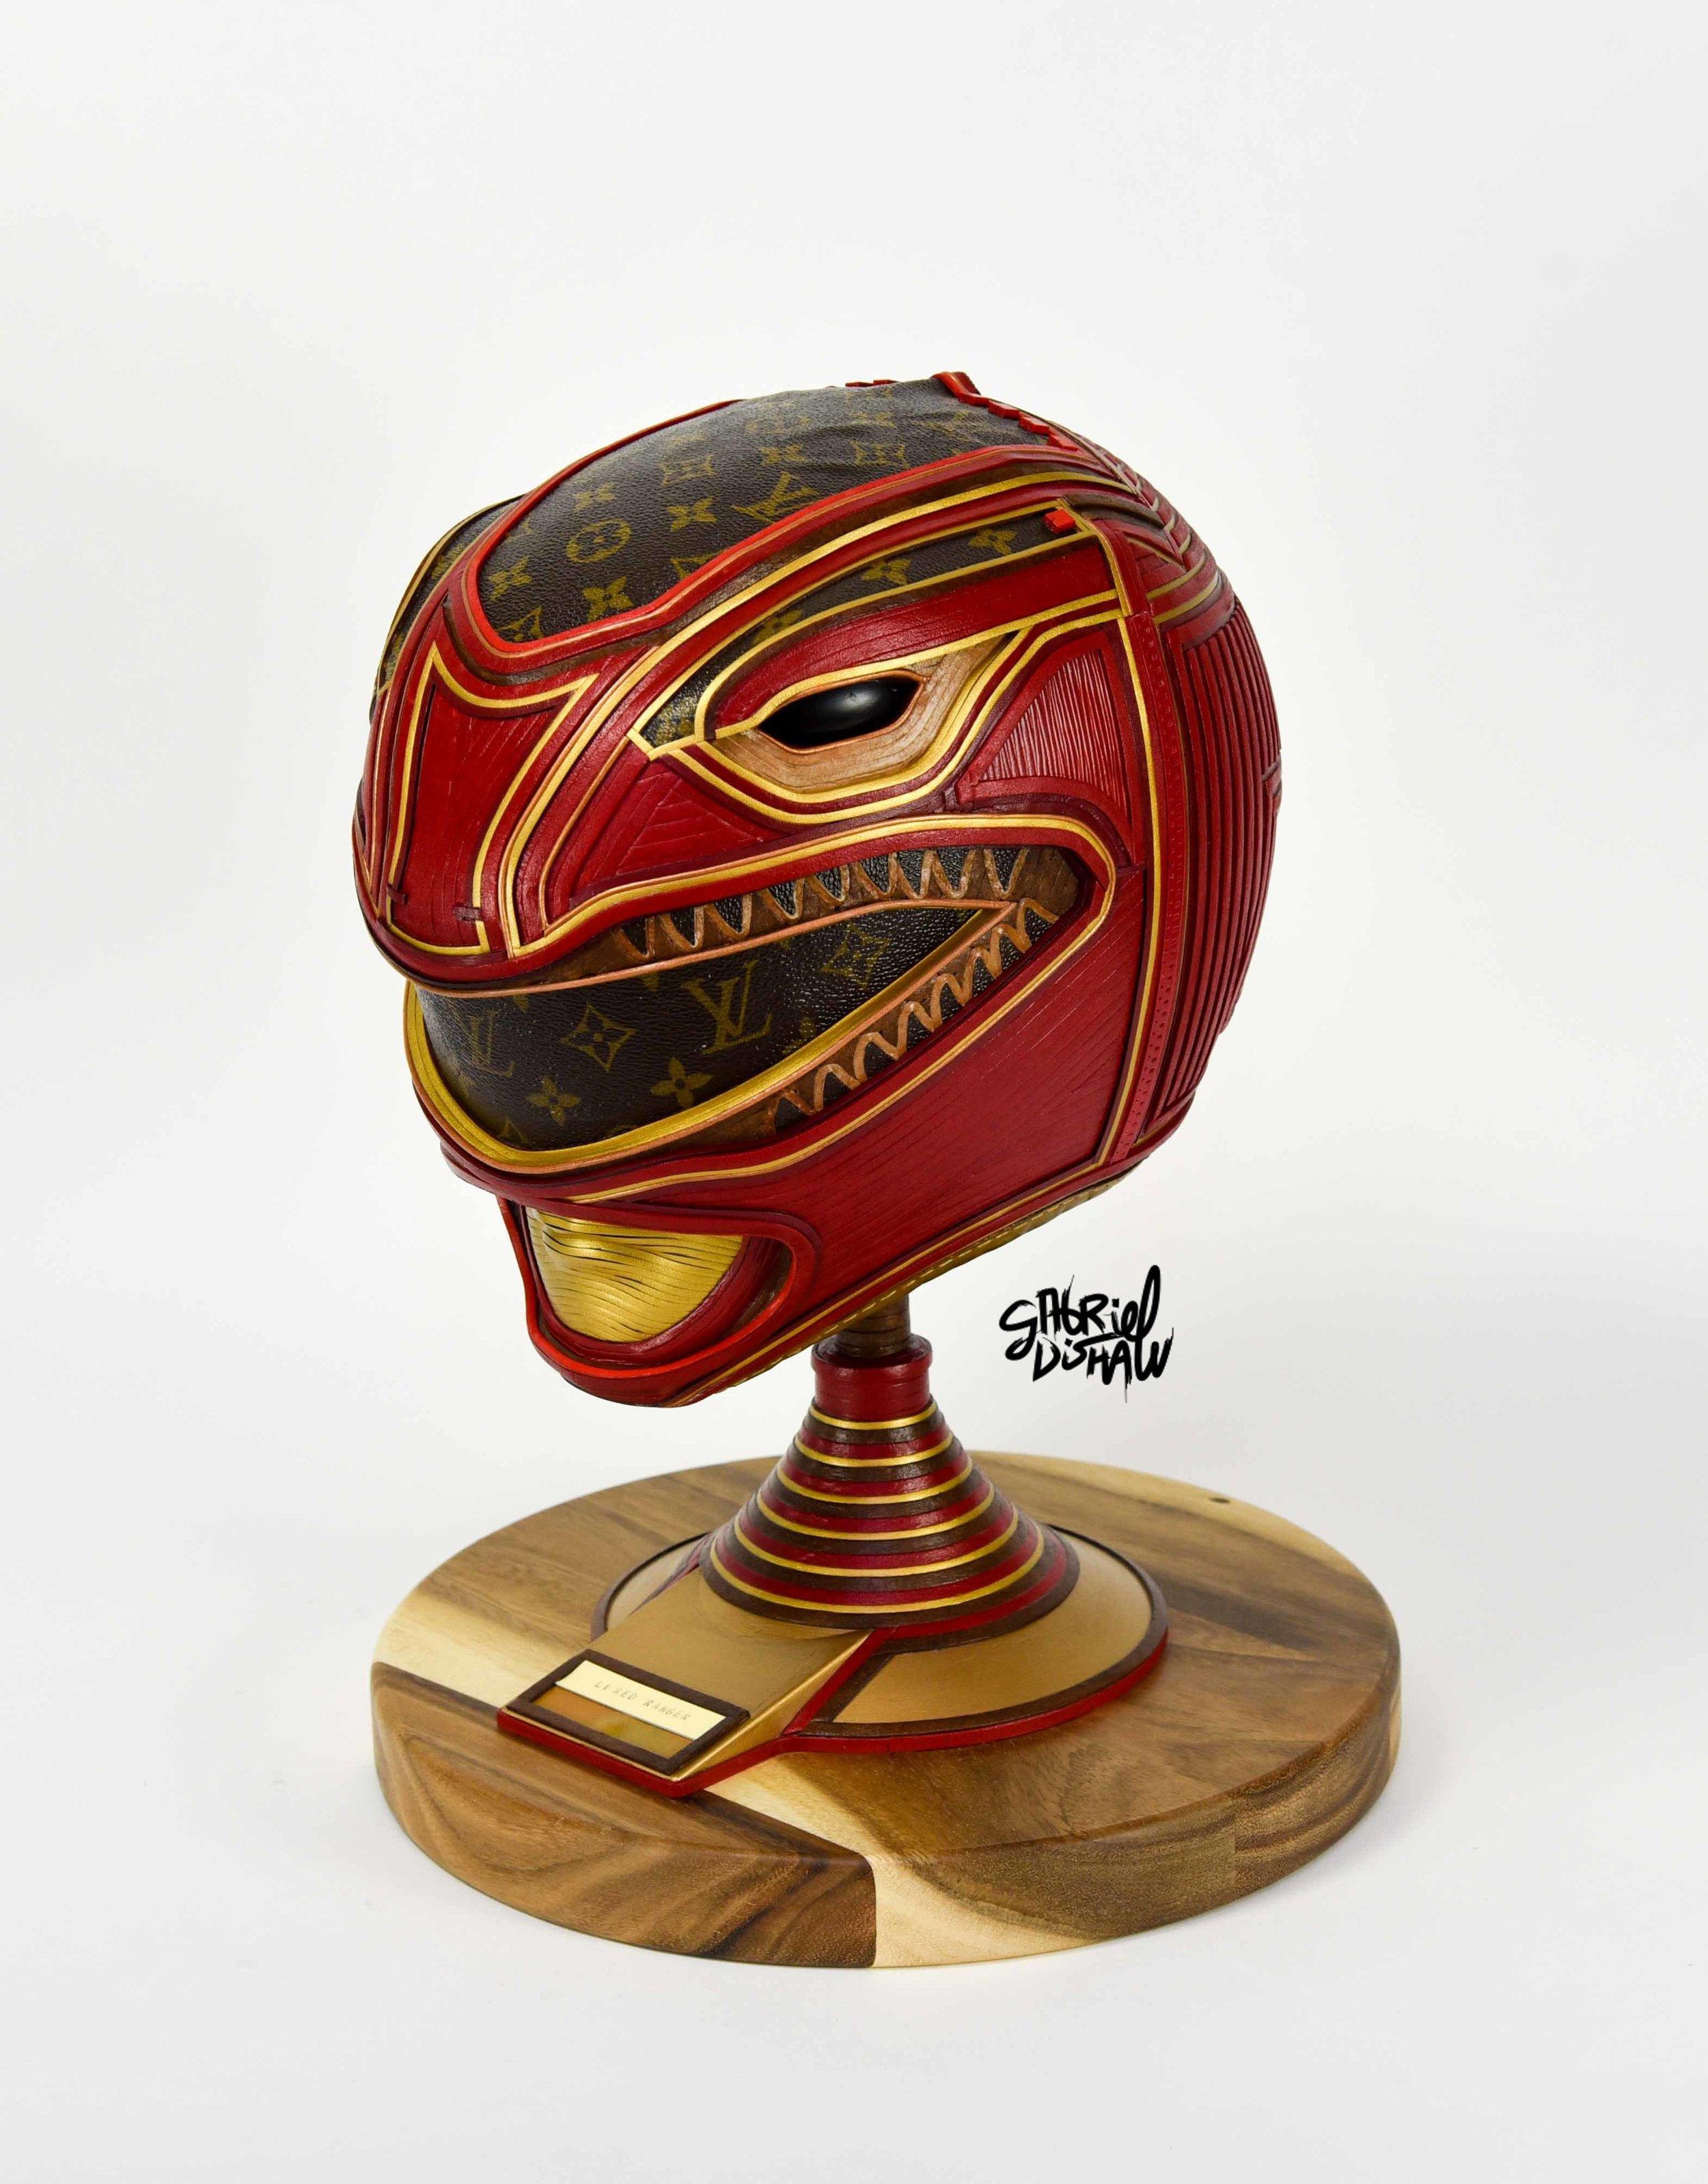 Gabriel Dishaw LV Red Ranger-3471.jpg